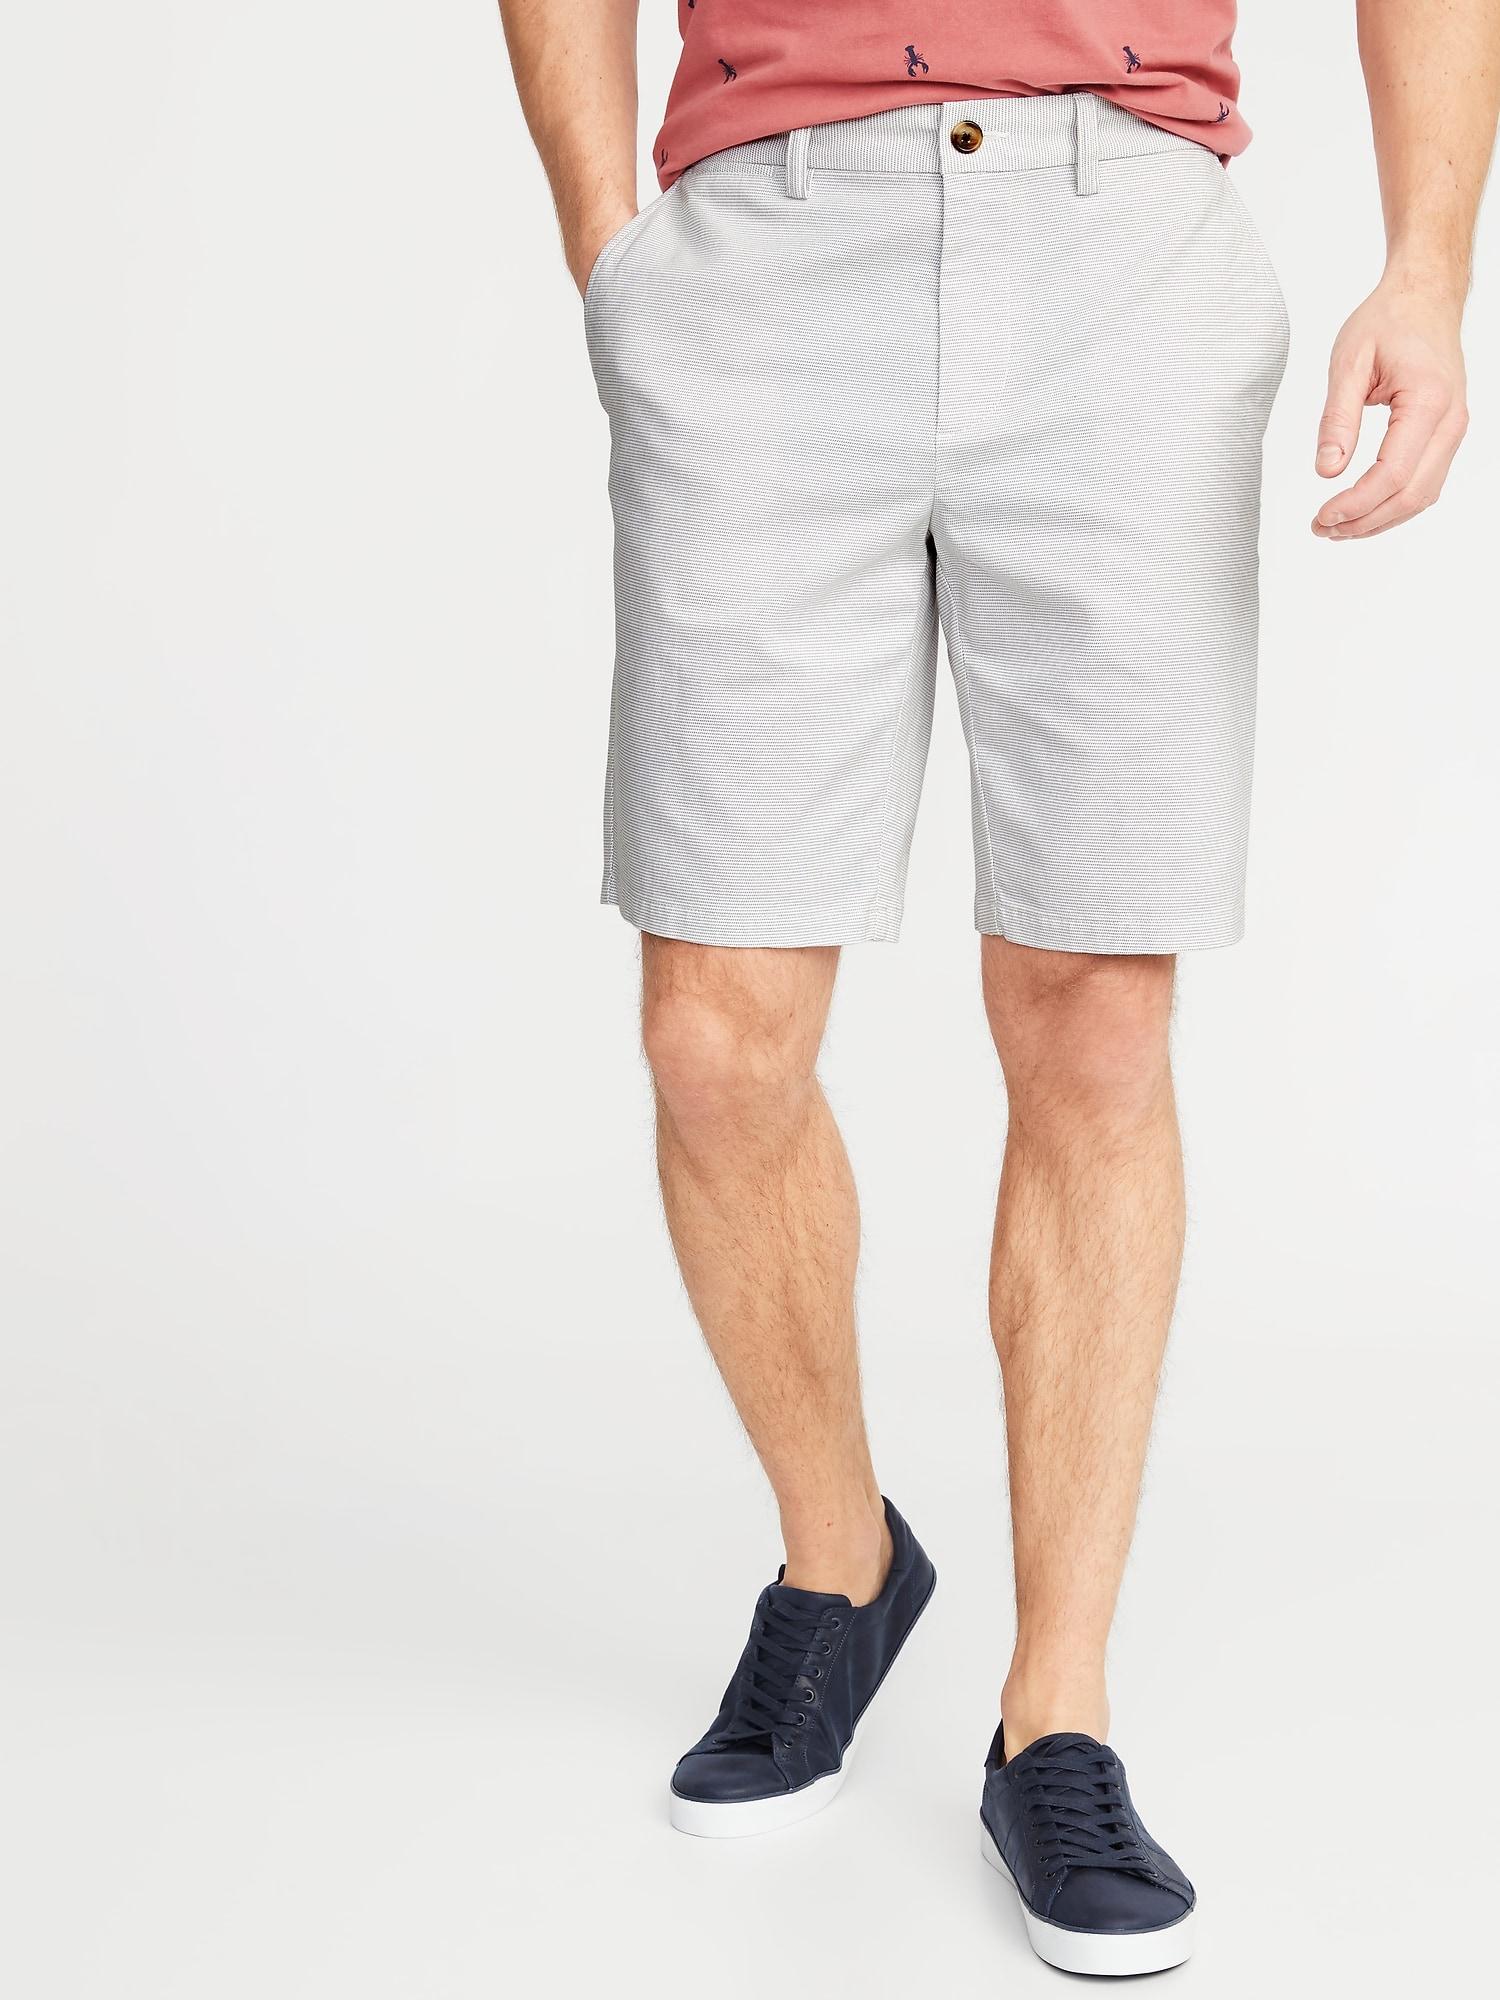 162f2c71935 Slim Ultimate Built-In Flex Shorts for Men -10-inch inseam